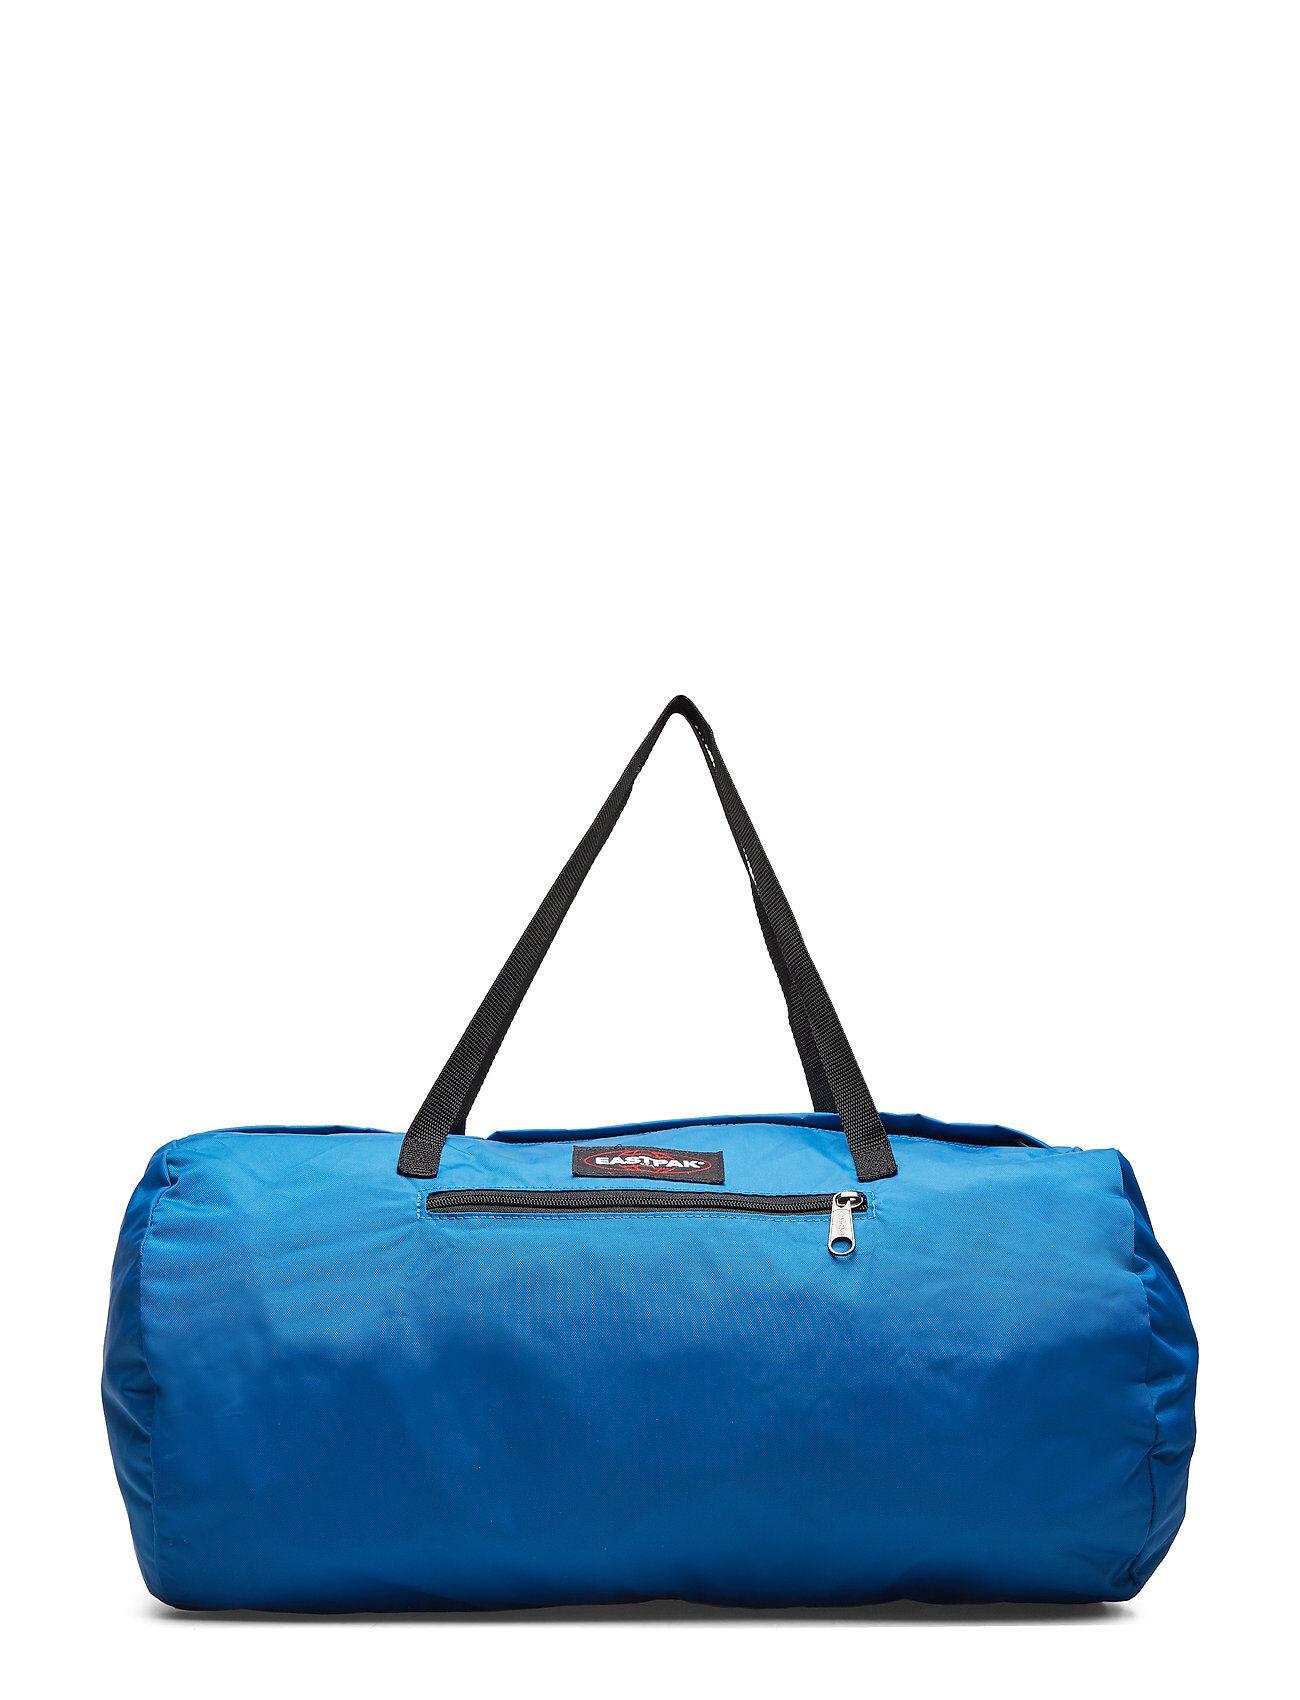 Image of Eastpak Renana Instant Bags Weekend & Gym Bags Sininen Eastpak